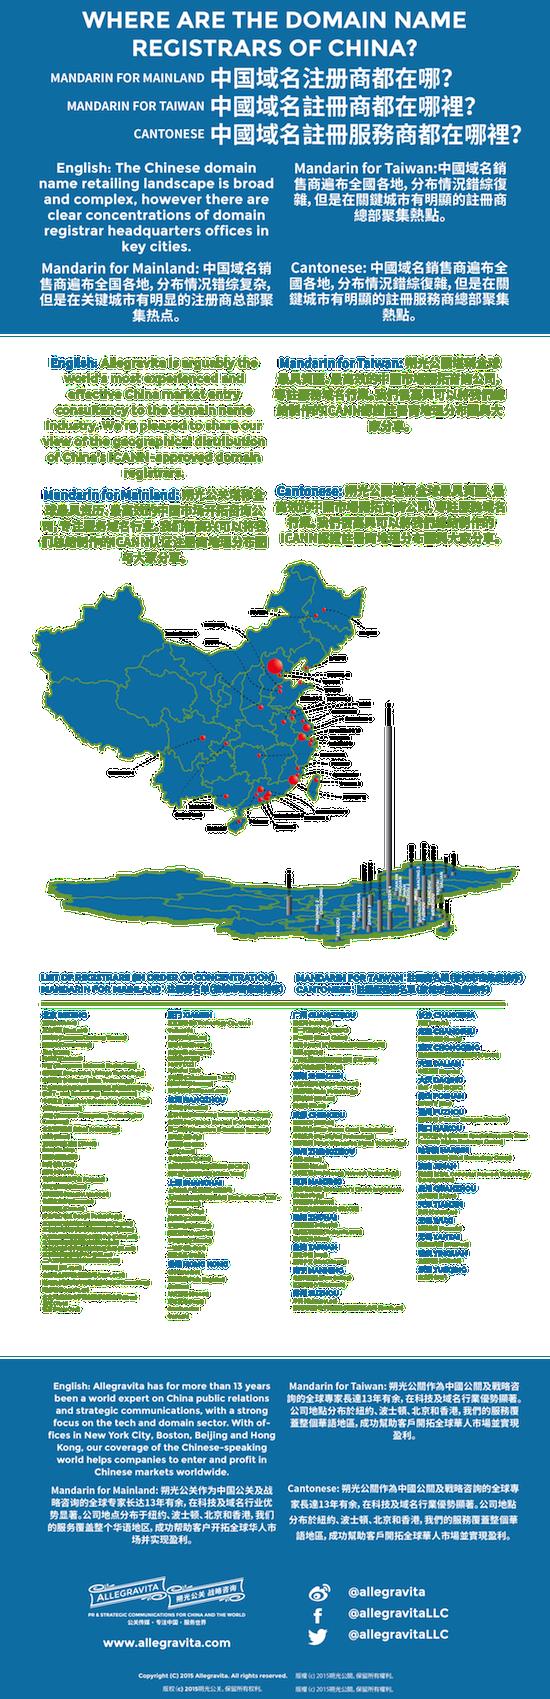 China registrars - small